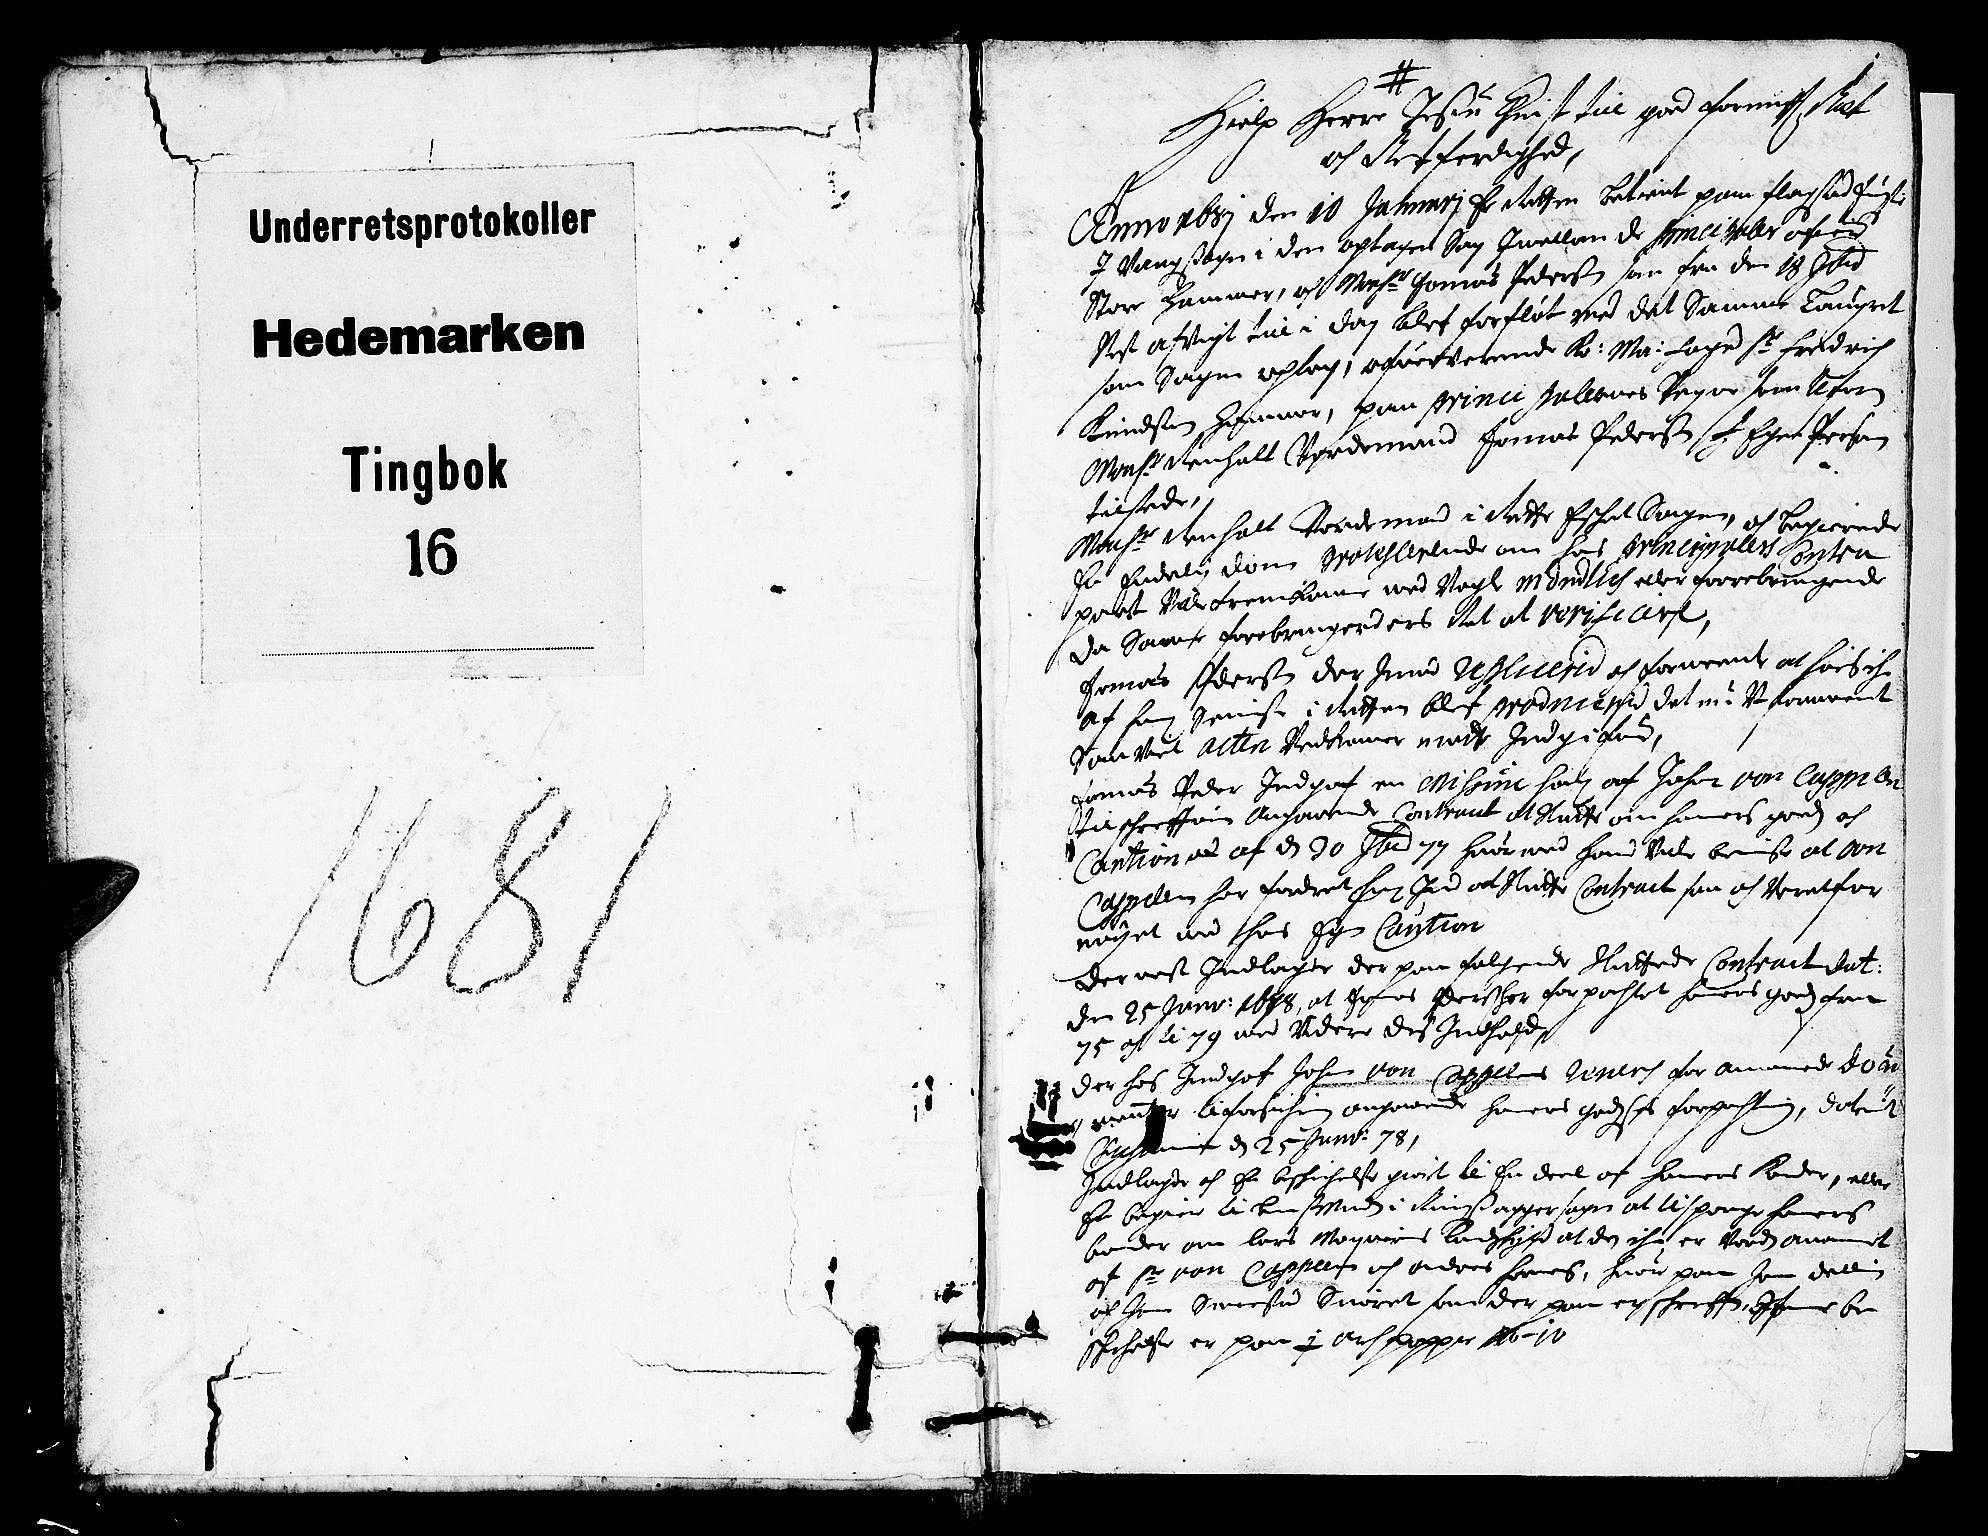 SAH, Hedemarken sorenskriveri, G/Gb/L0017: Tingbok, 1681, s. 0b-1a